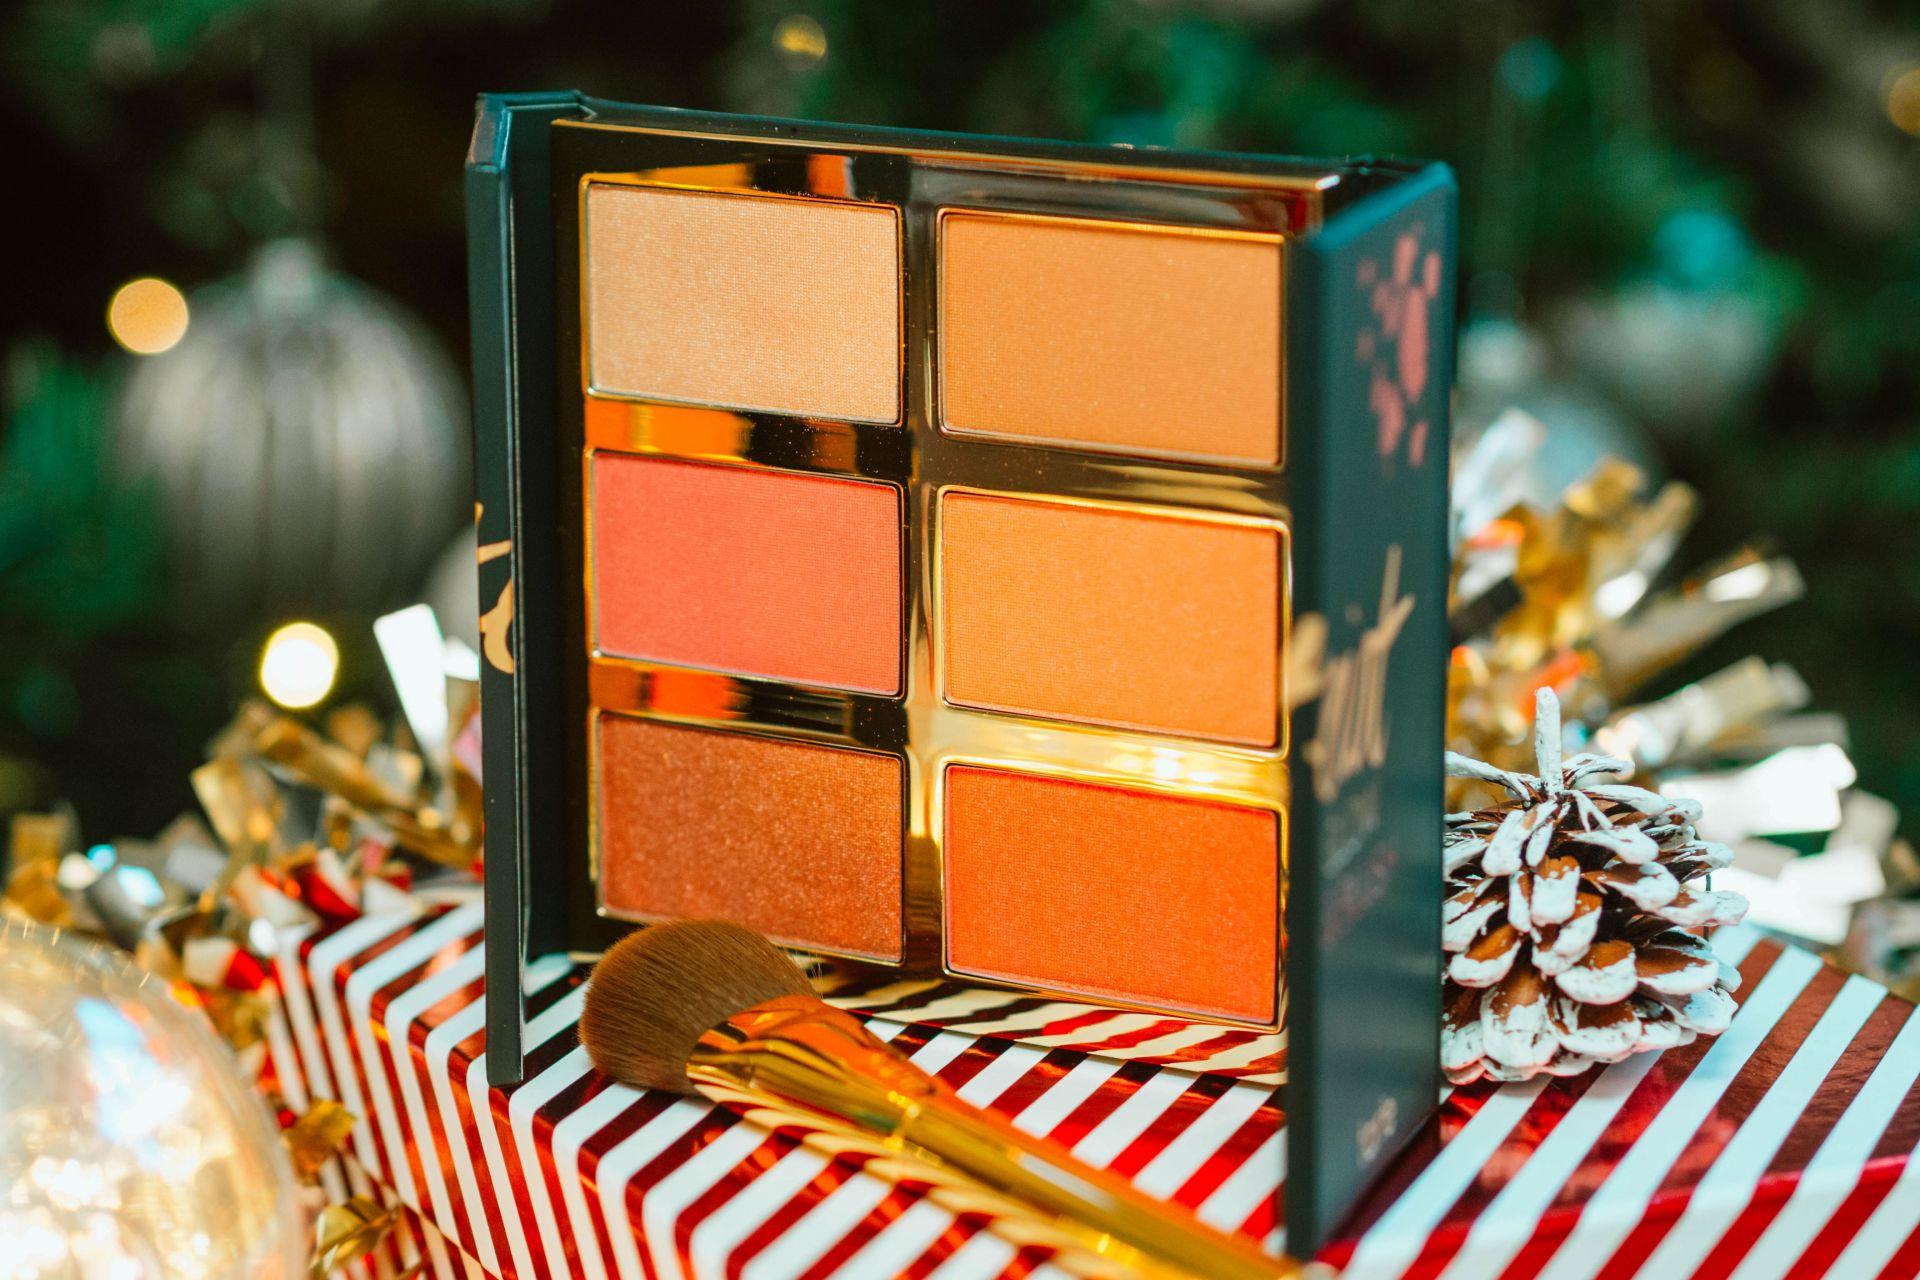 Tarte Tarteist Pro Glow & Blush Cheek Palette Review